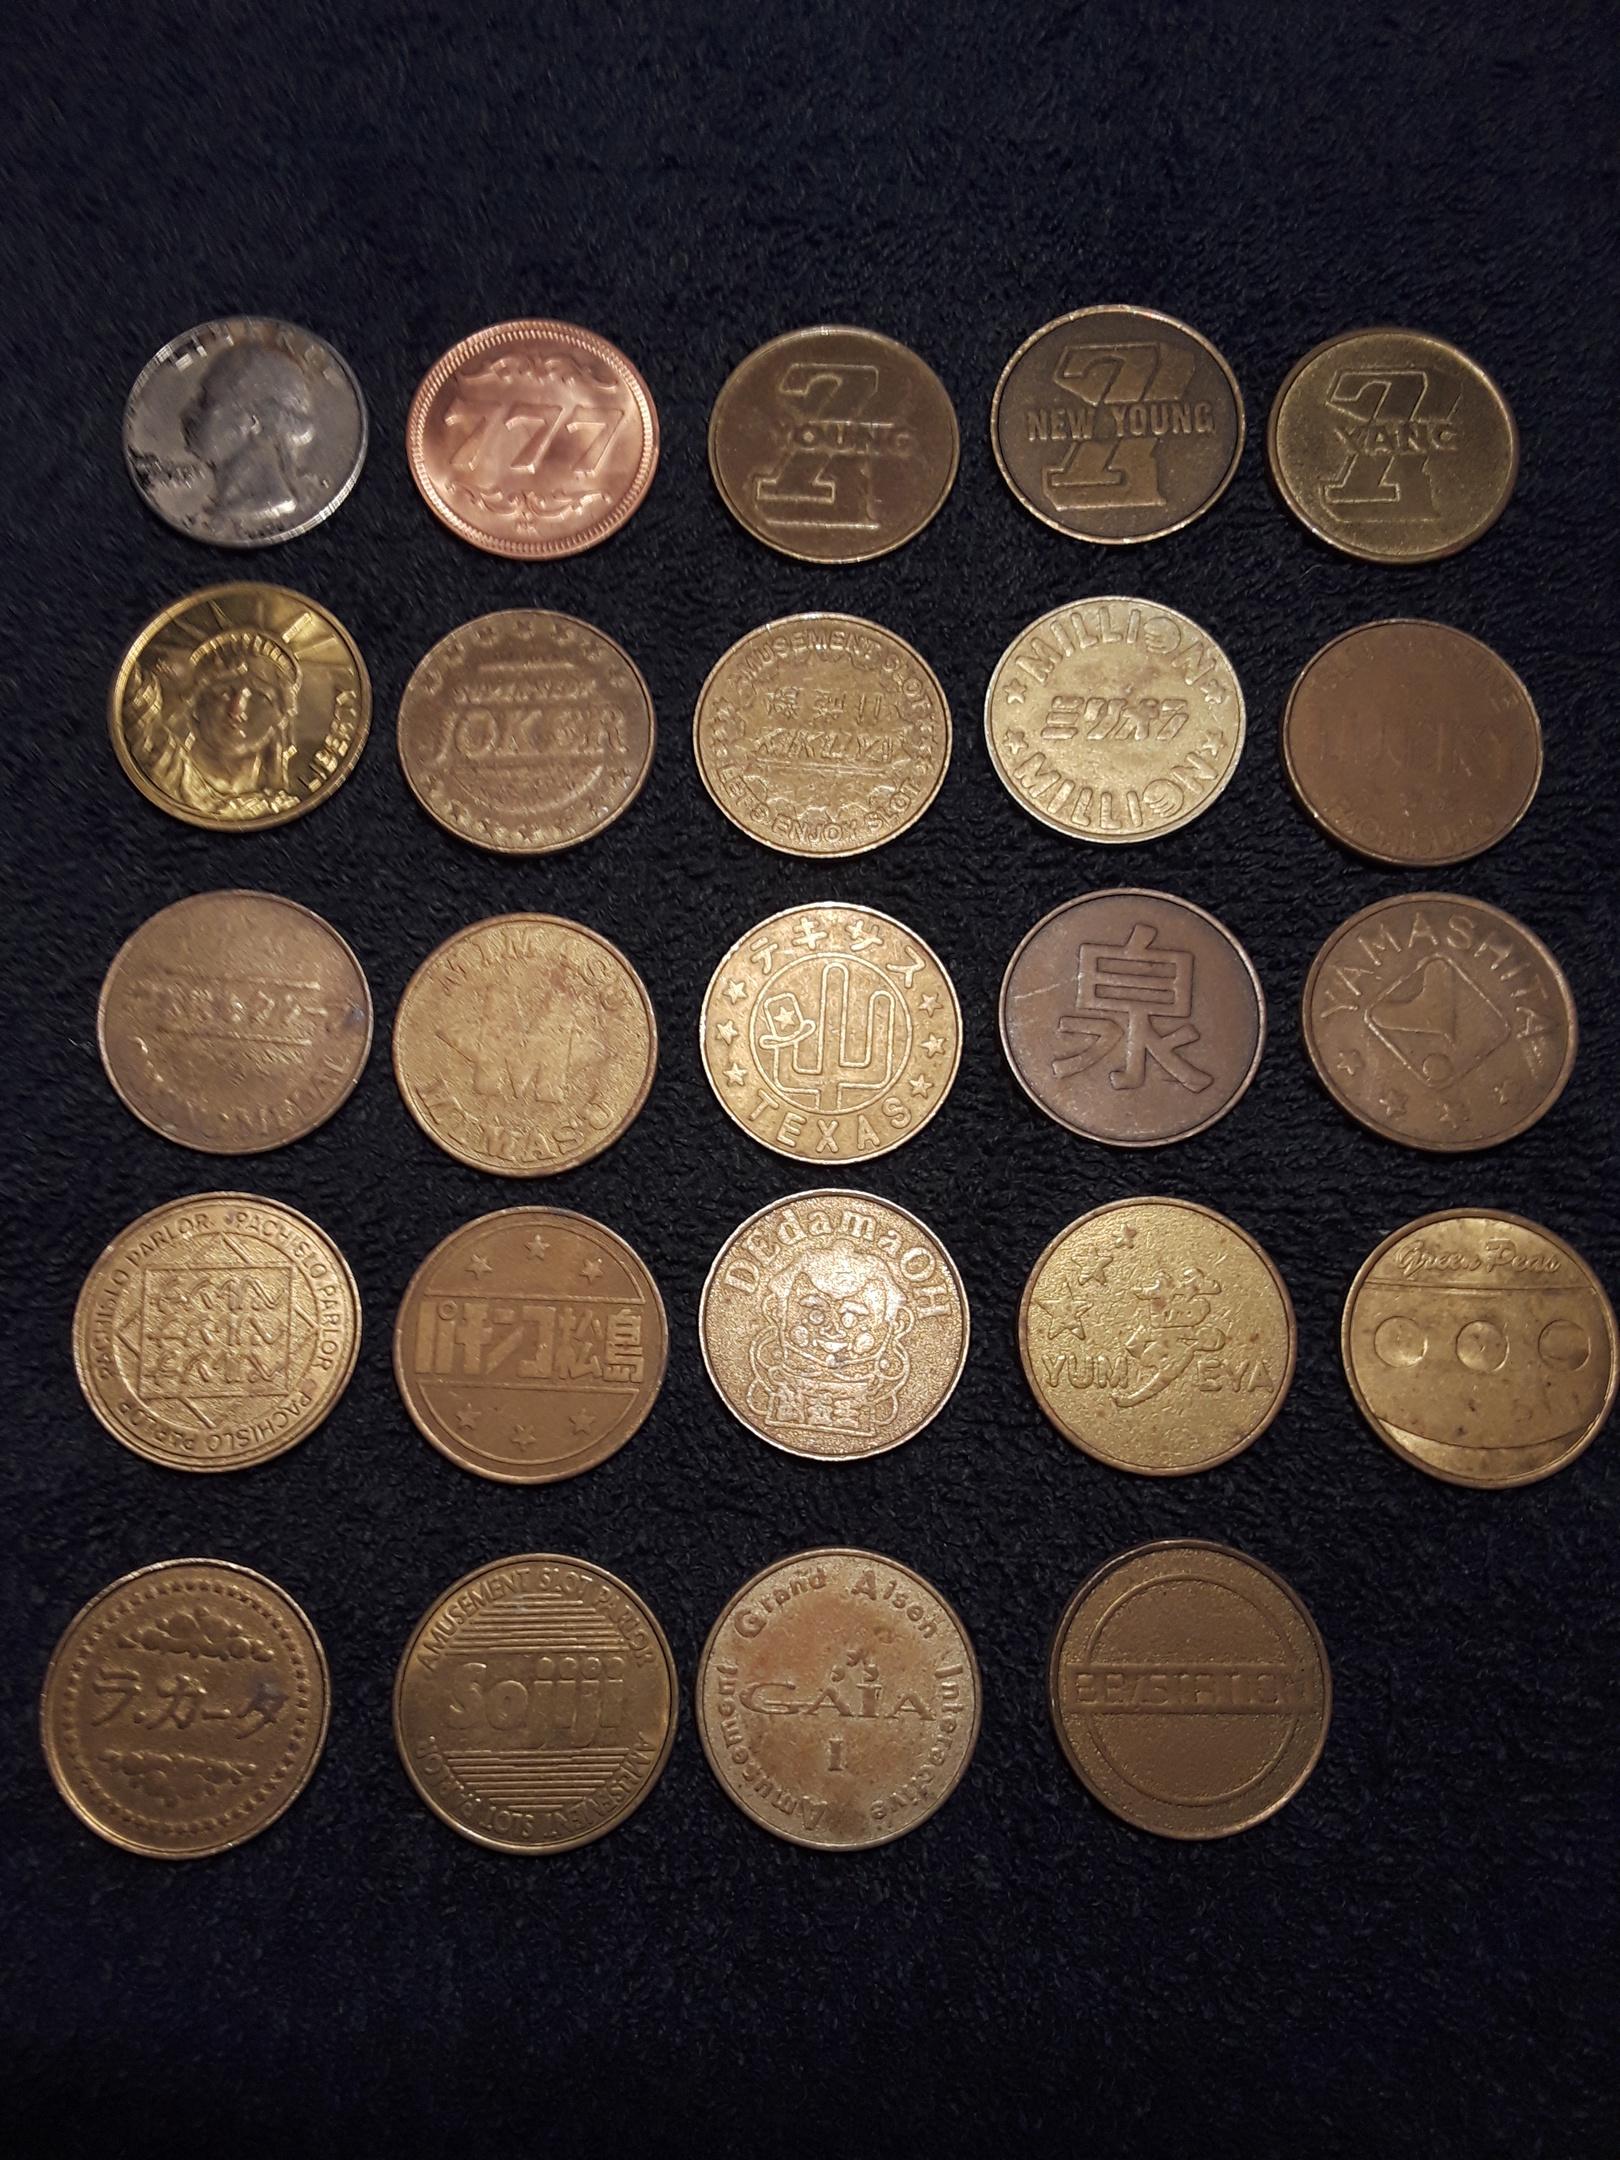 Pachislo coin worth money